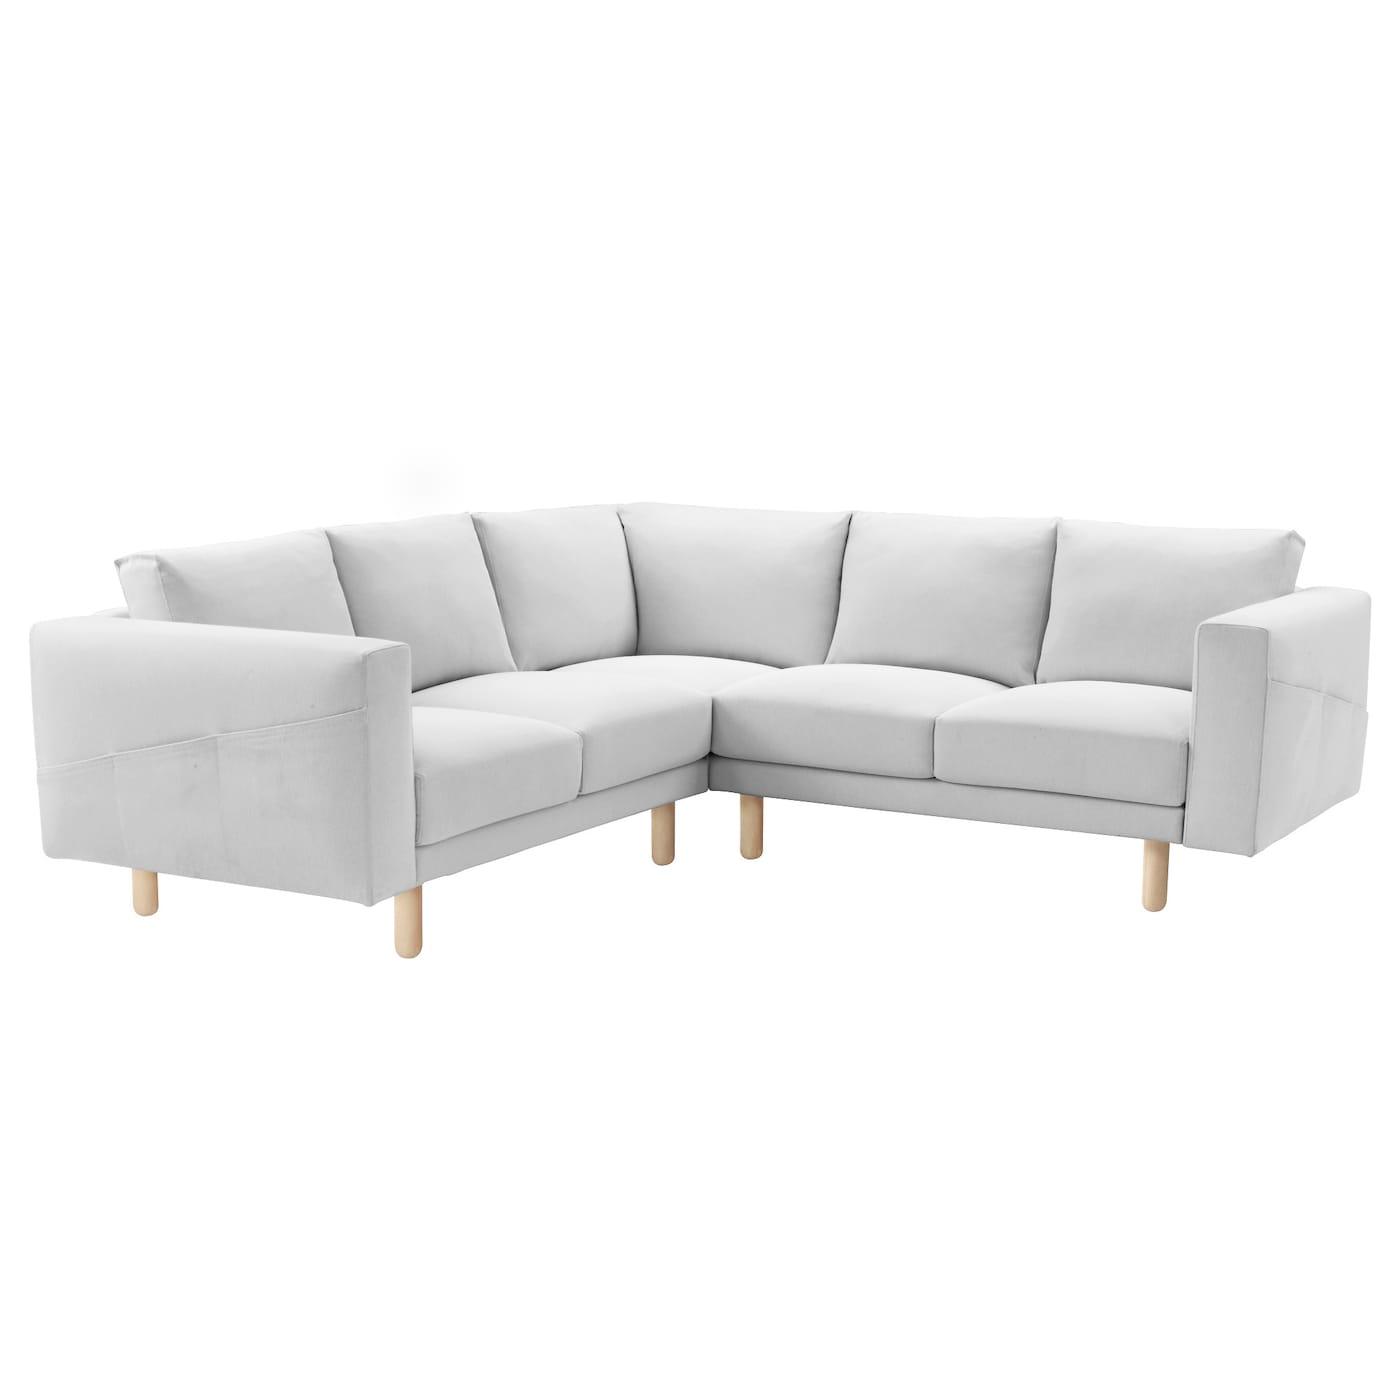 Norsborg corner sofa 2 2 finnsta white birch ikea for Ikea corner sofa